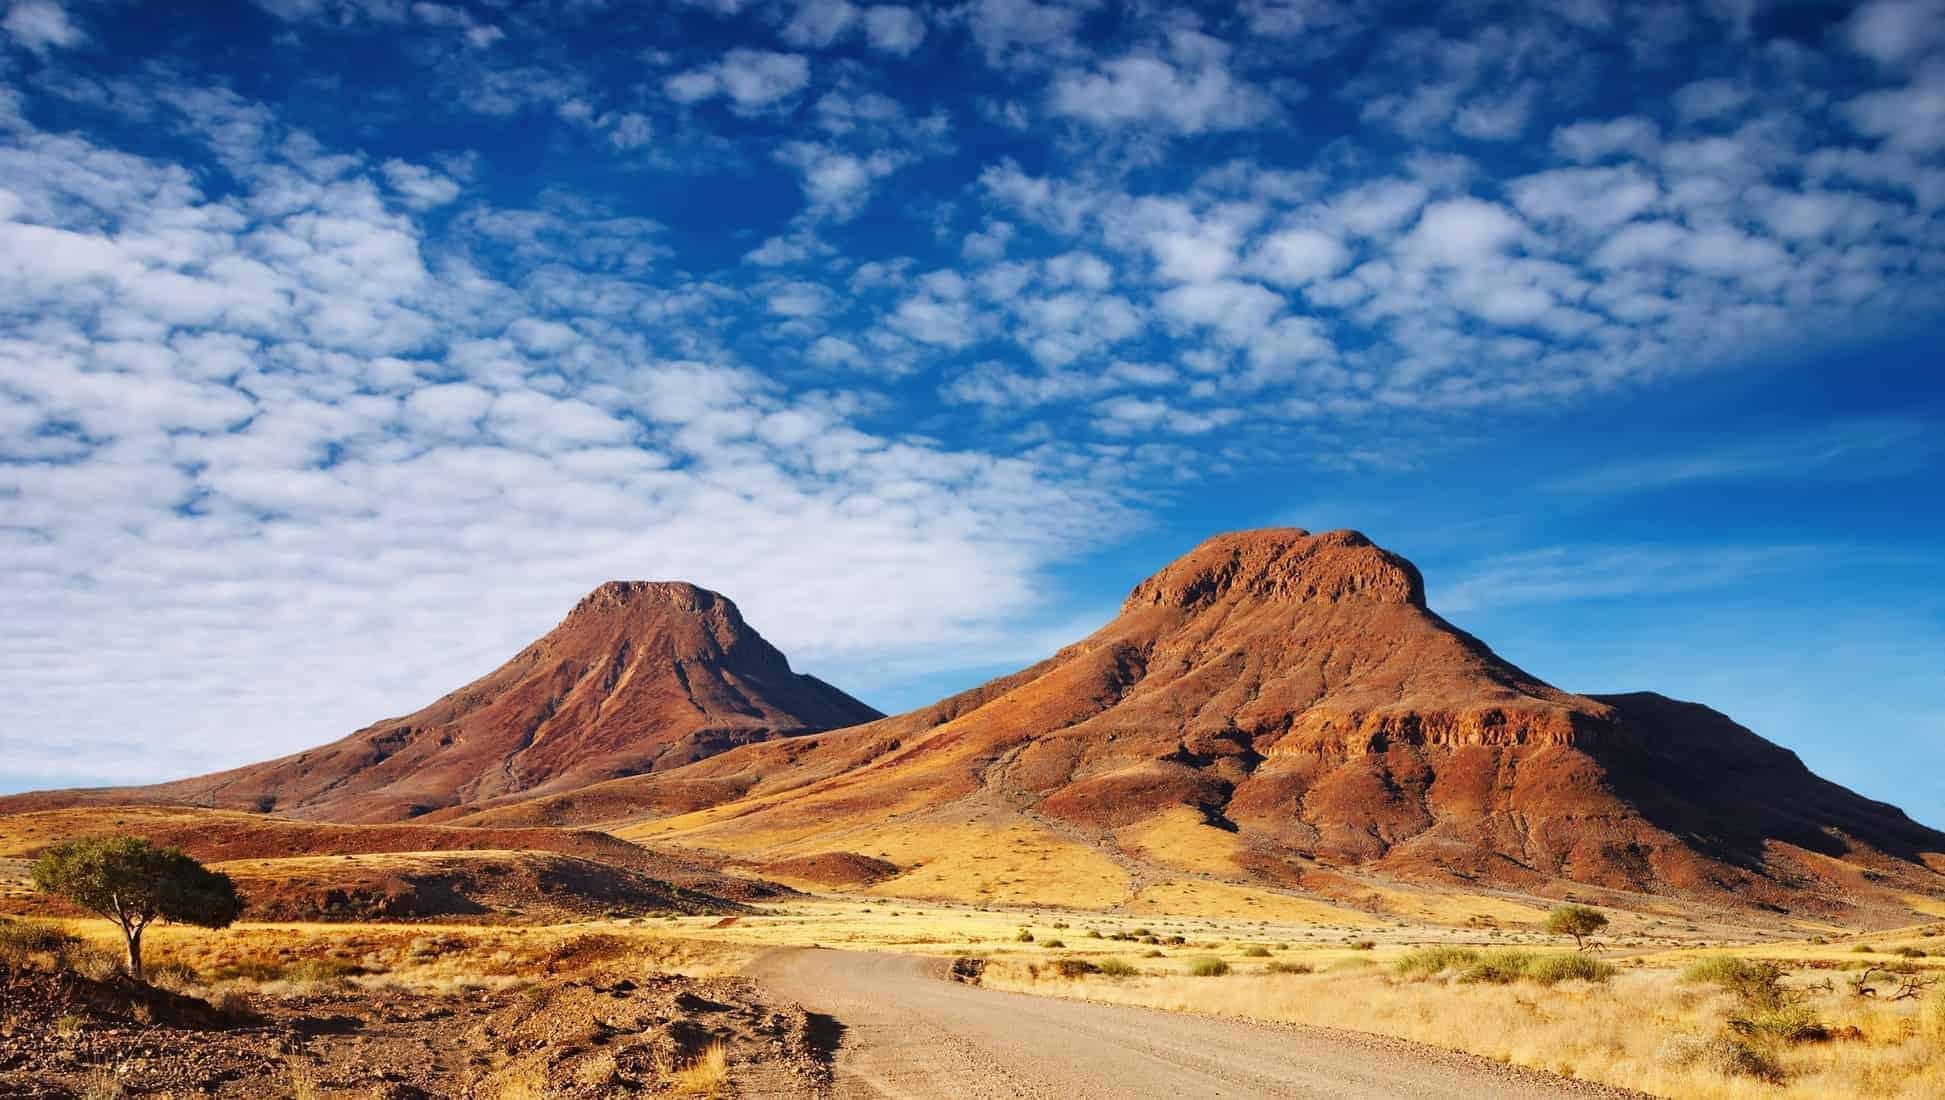 Namibia-Kalahari-desert-